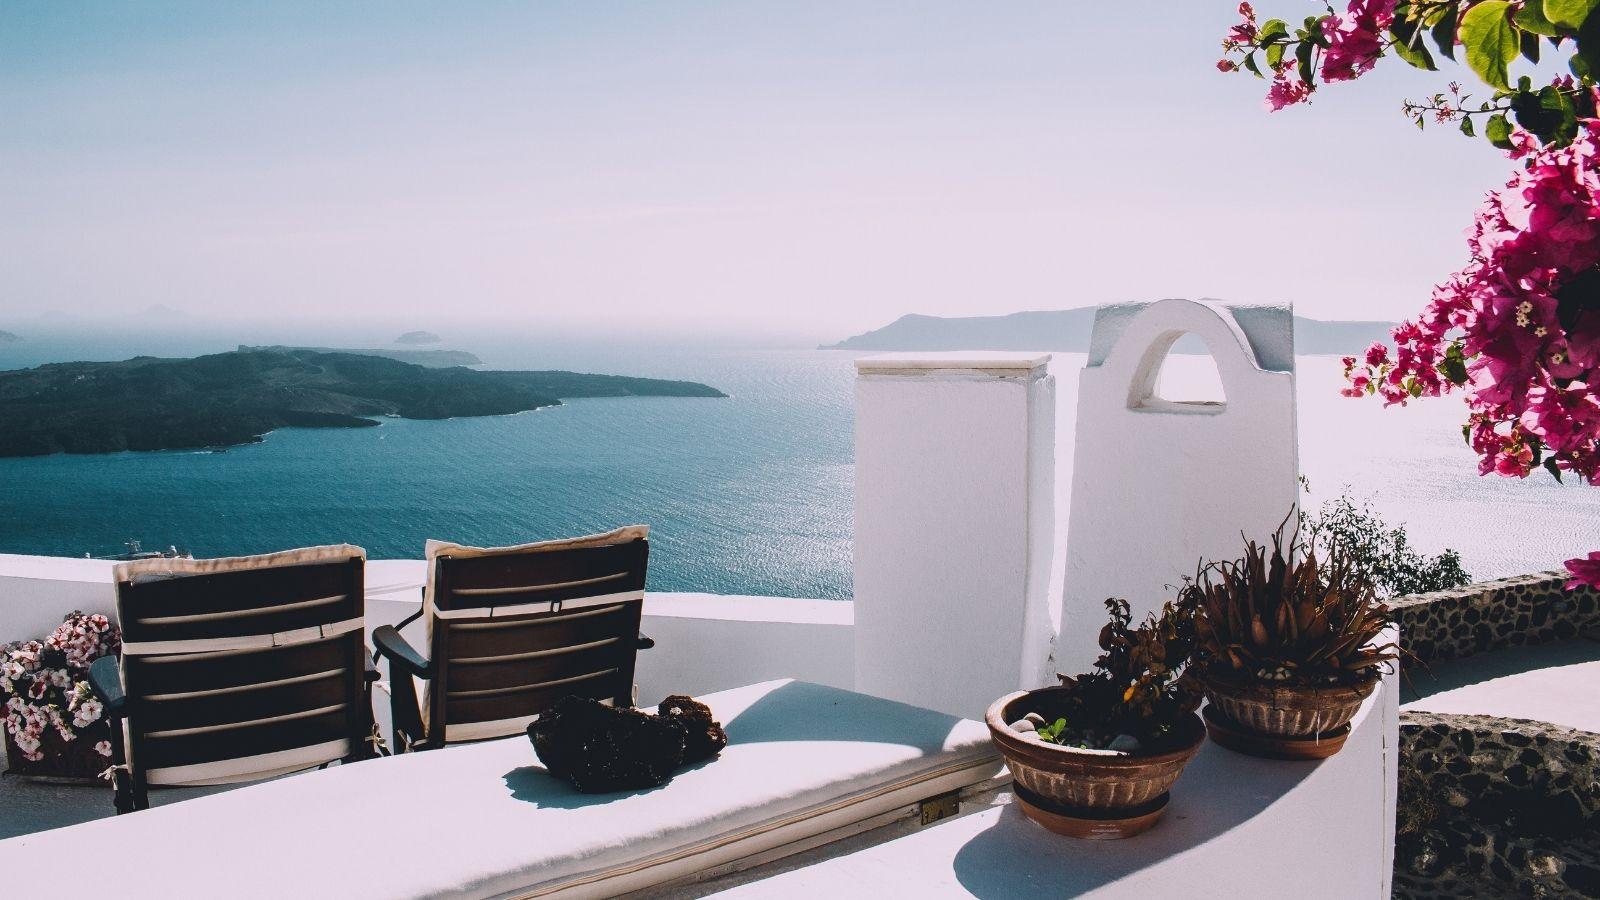 Retire abroad: Top 4 alternative retirement hotspots for Brits